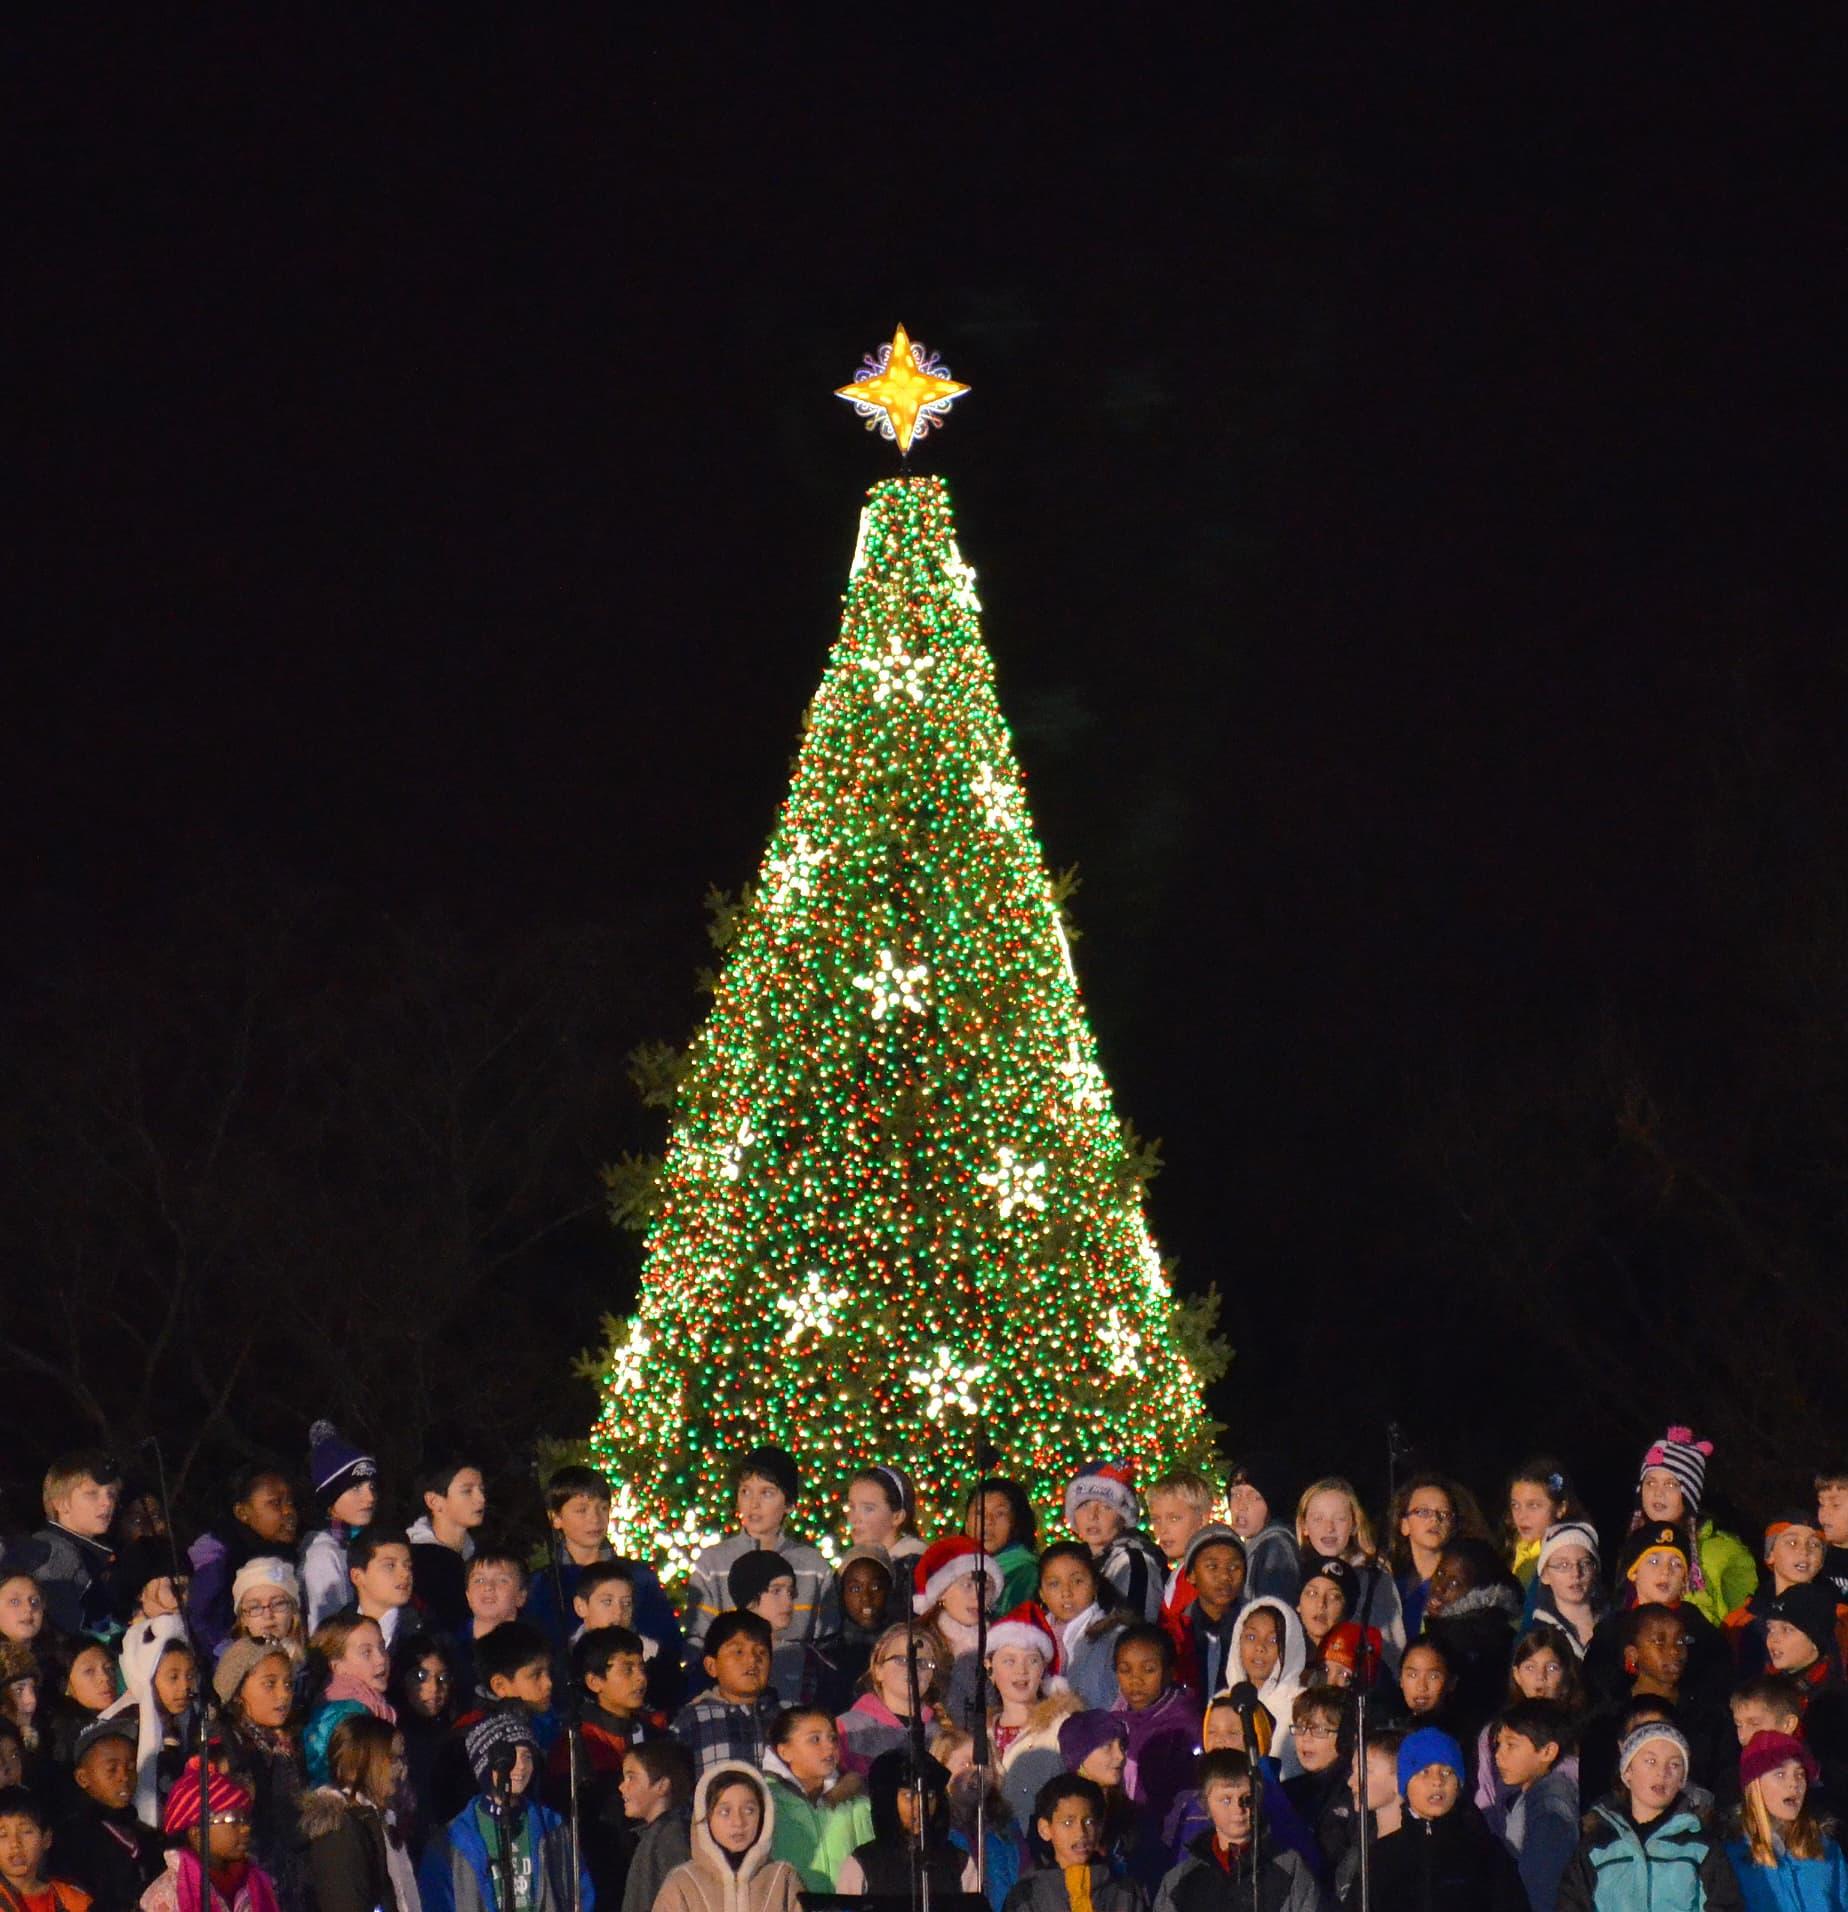 Childrens_choir_-_US_National_Christmas_Tree_2012